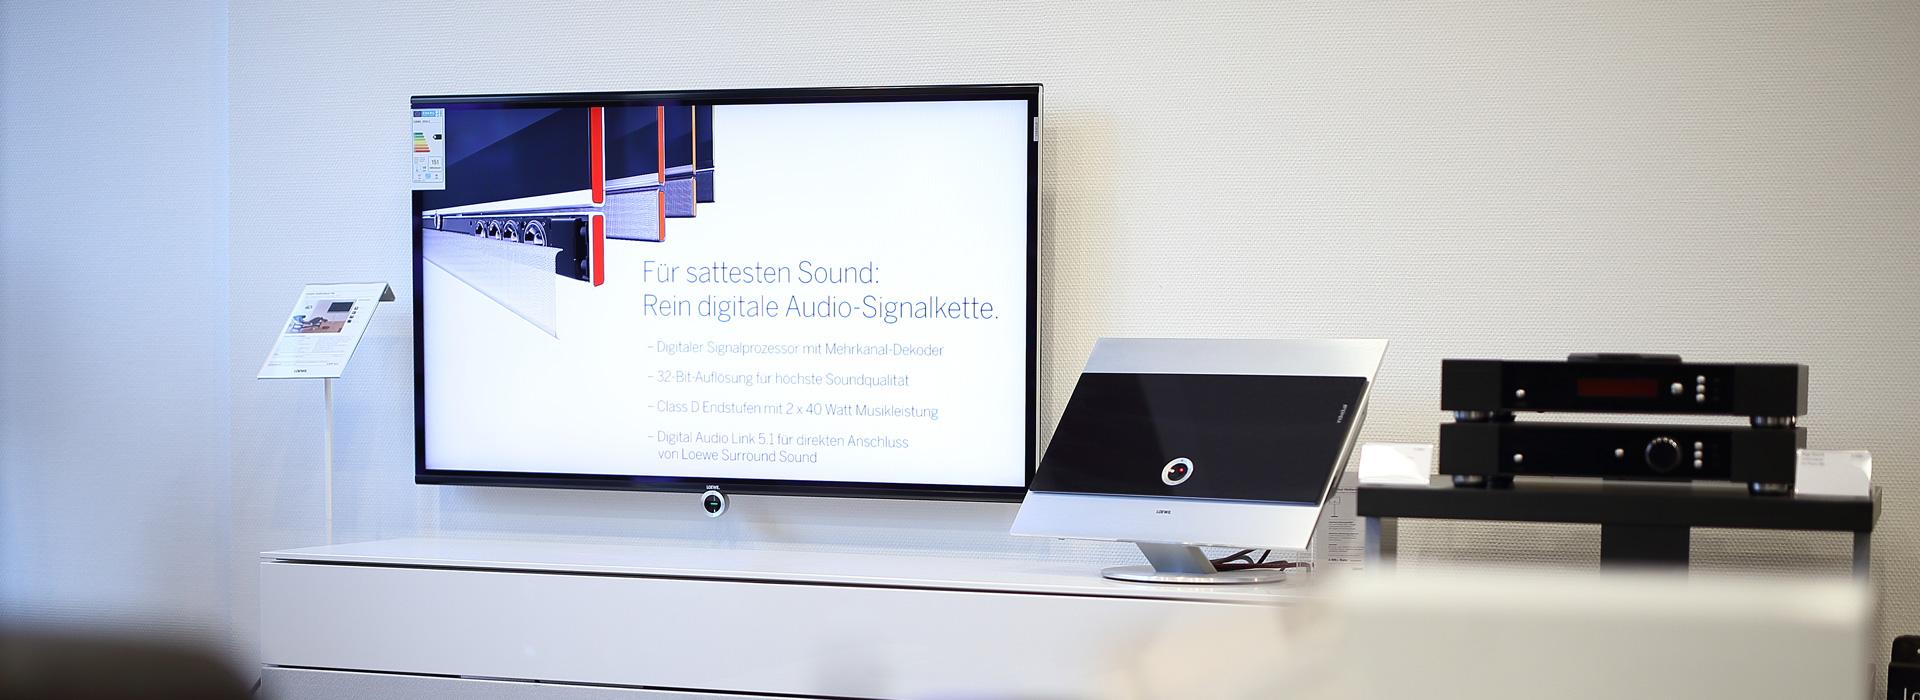 sound@home - Loewe TV